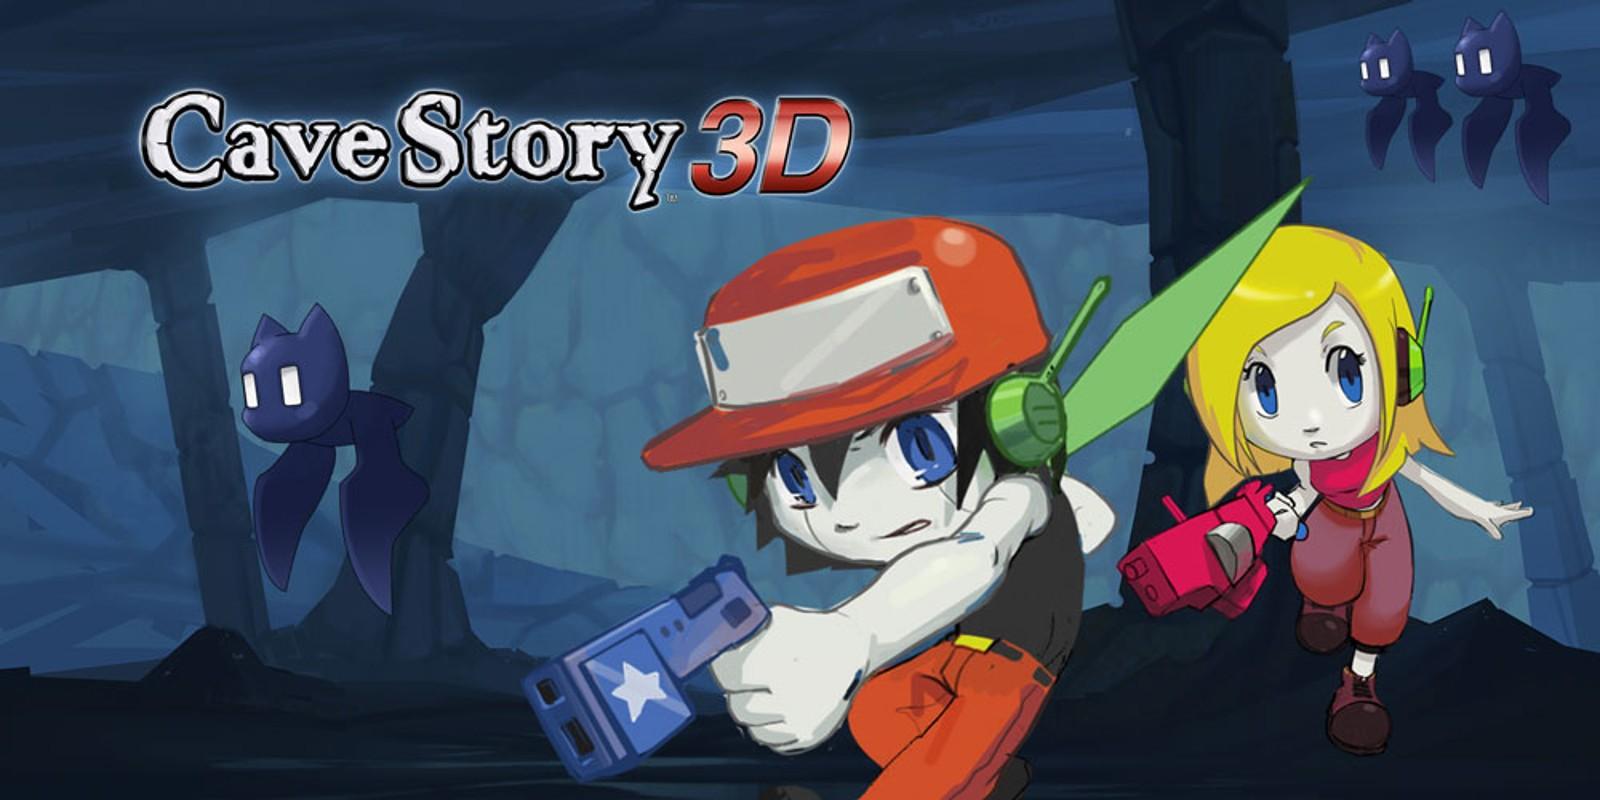 Cave Story 3d Nintendo 3ds Games Nintendo